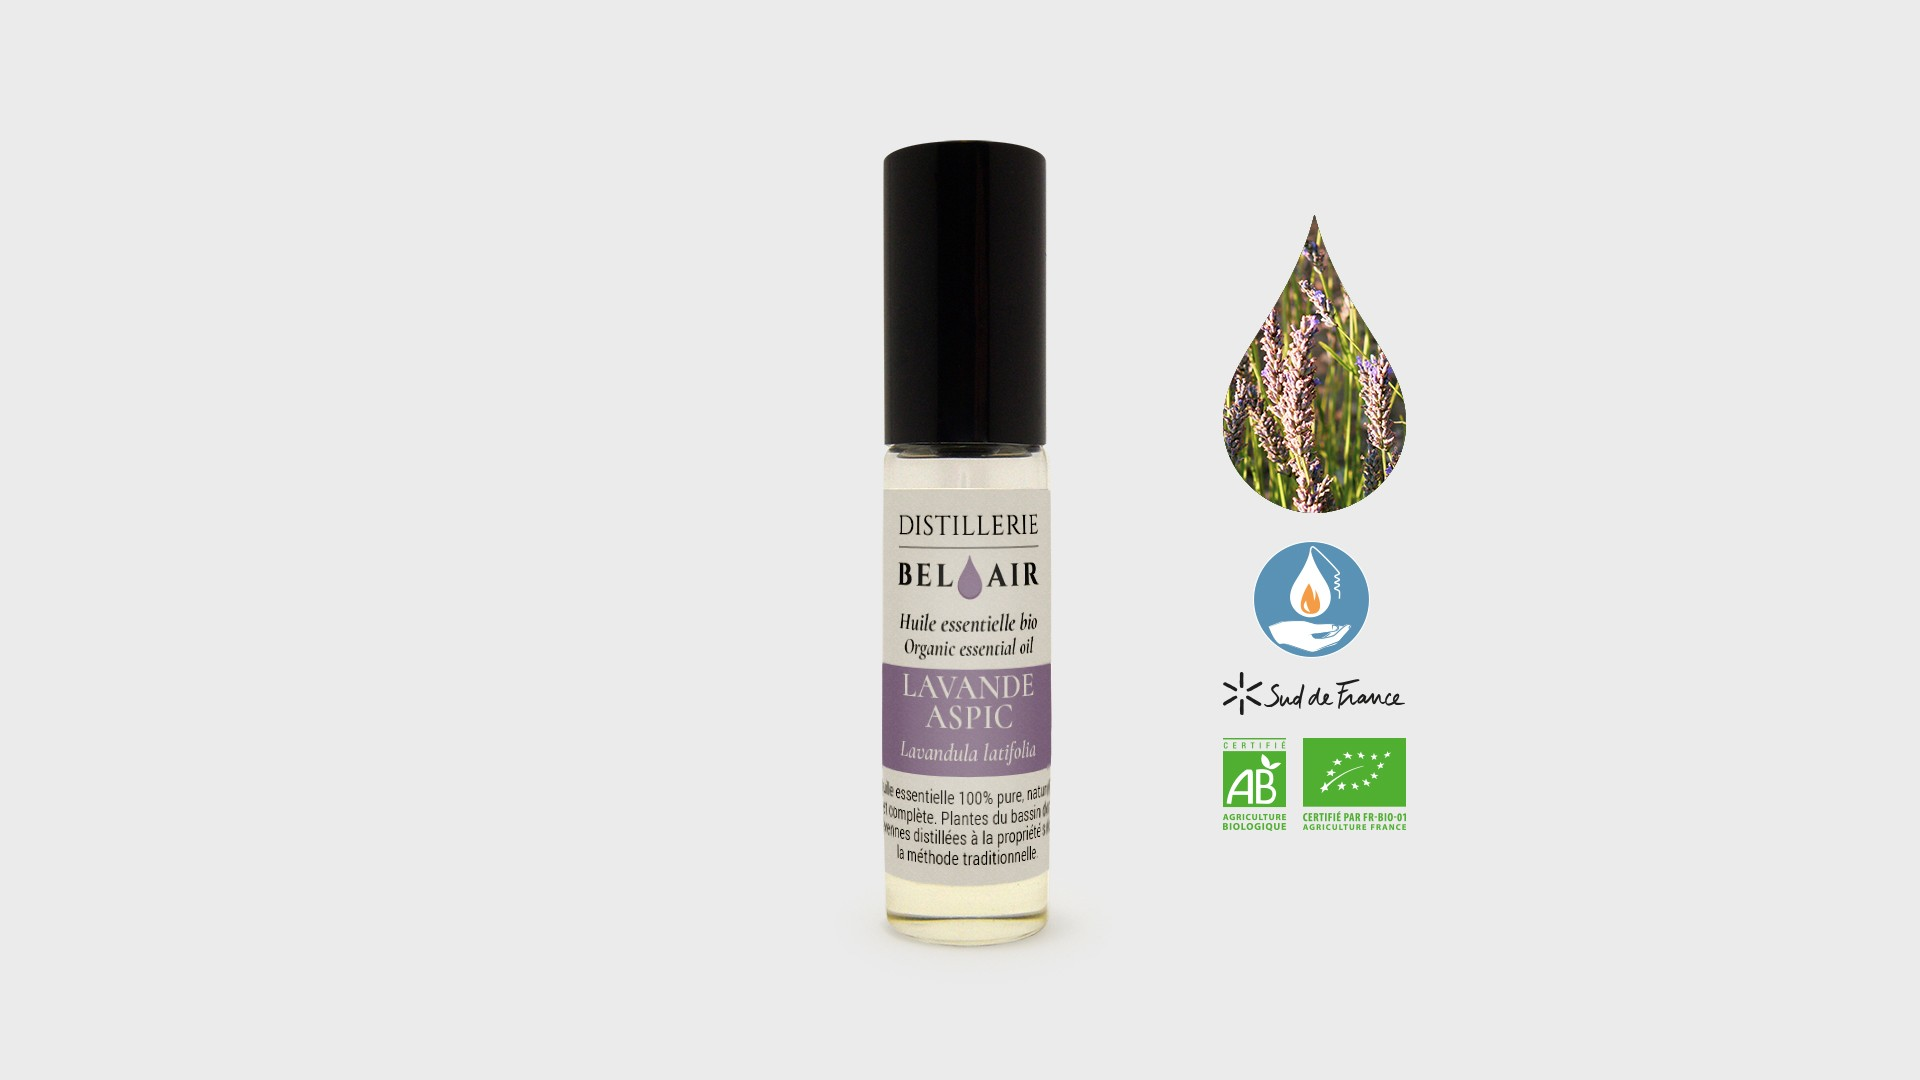 He Lavande Aspic roll-on d'huile essentielle bio